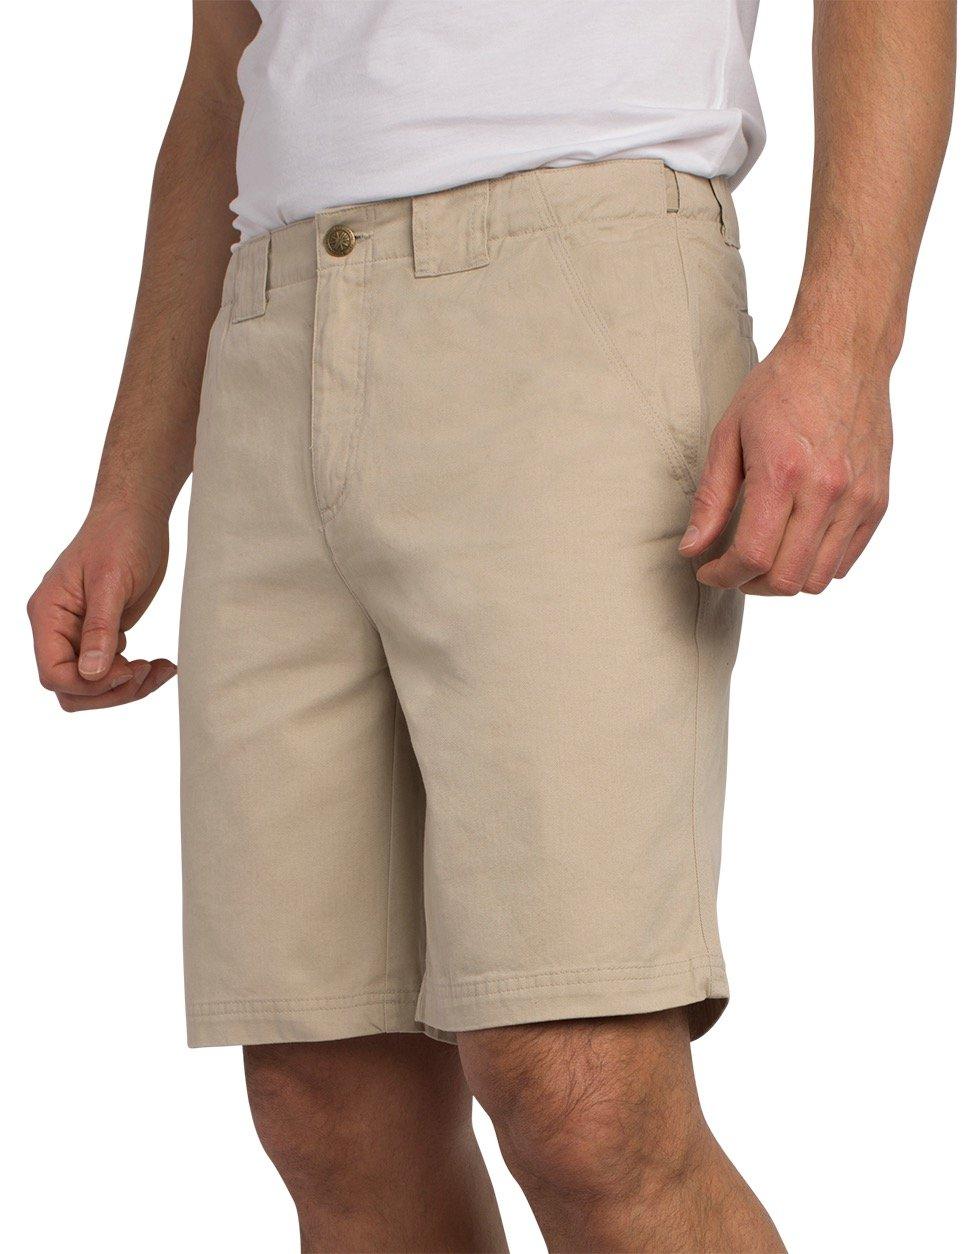 SCOTTeVEST Hidden Cargo Shorts - 8 Pockets – Comfortable Travel Clothing PBL 34